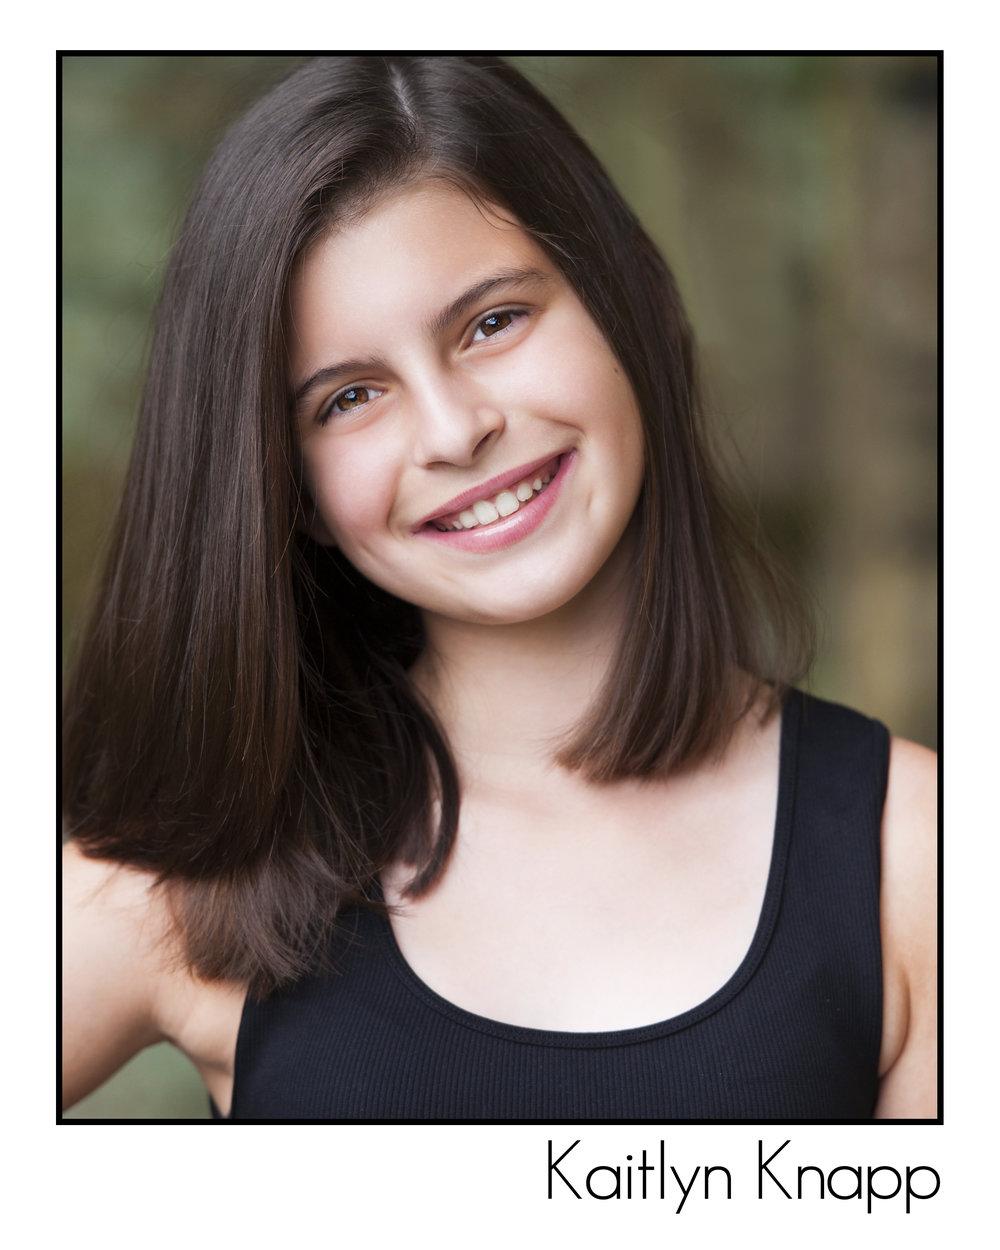 Kaitlyn Knapp 8 by 10.jpg